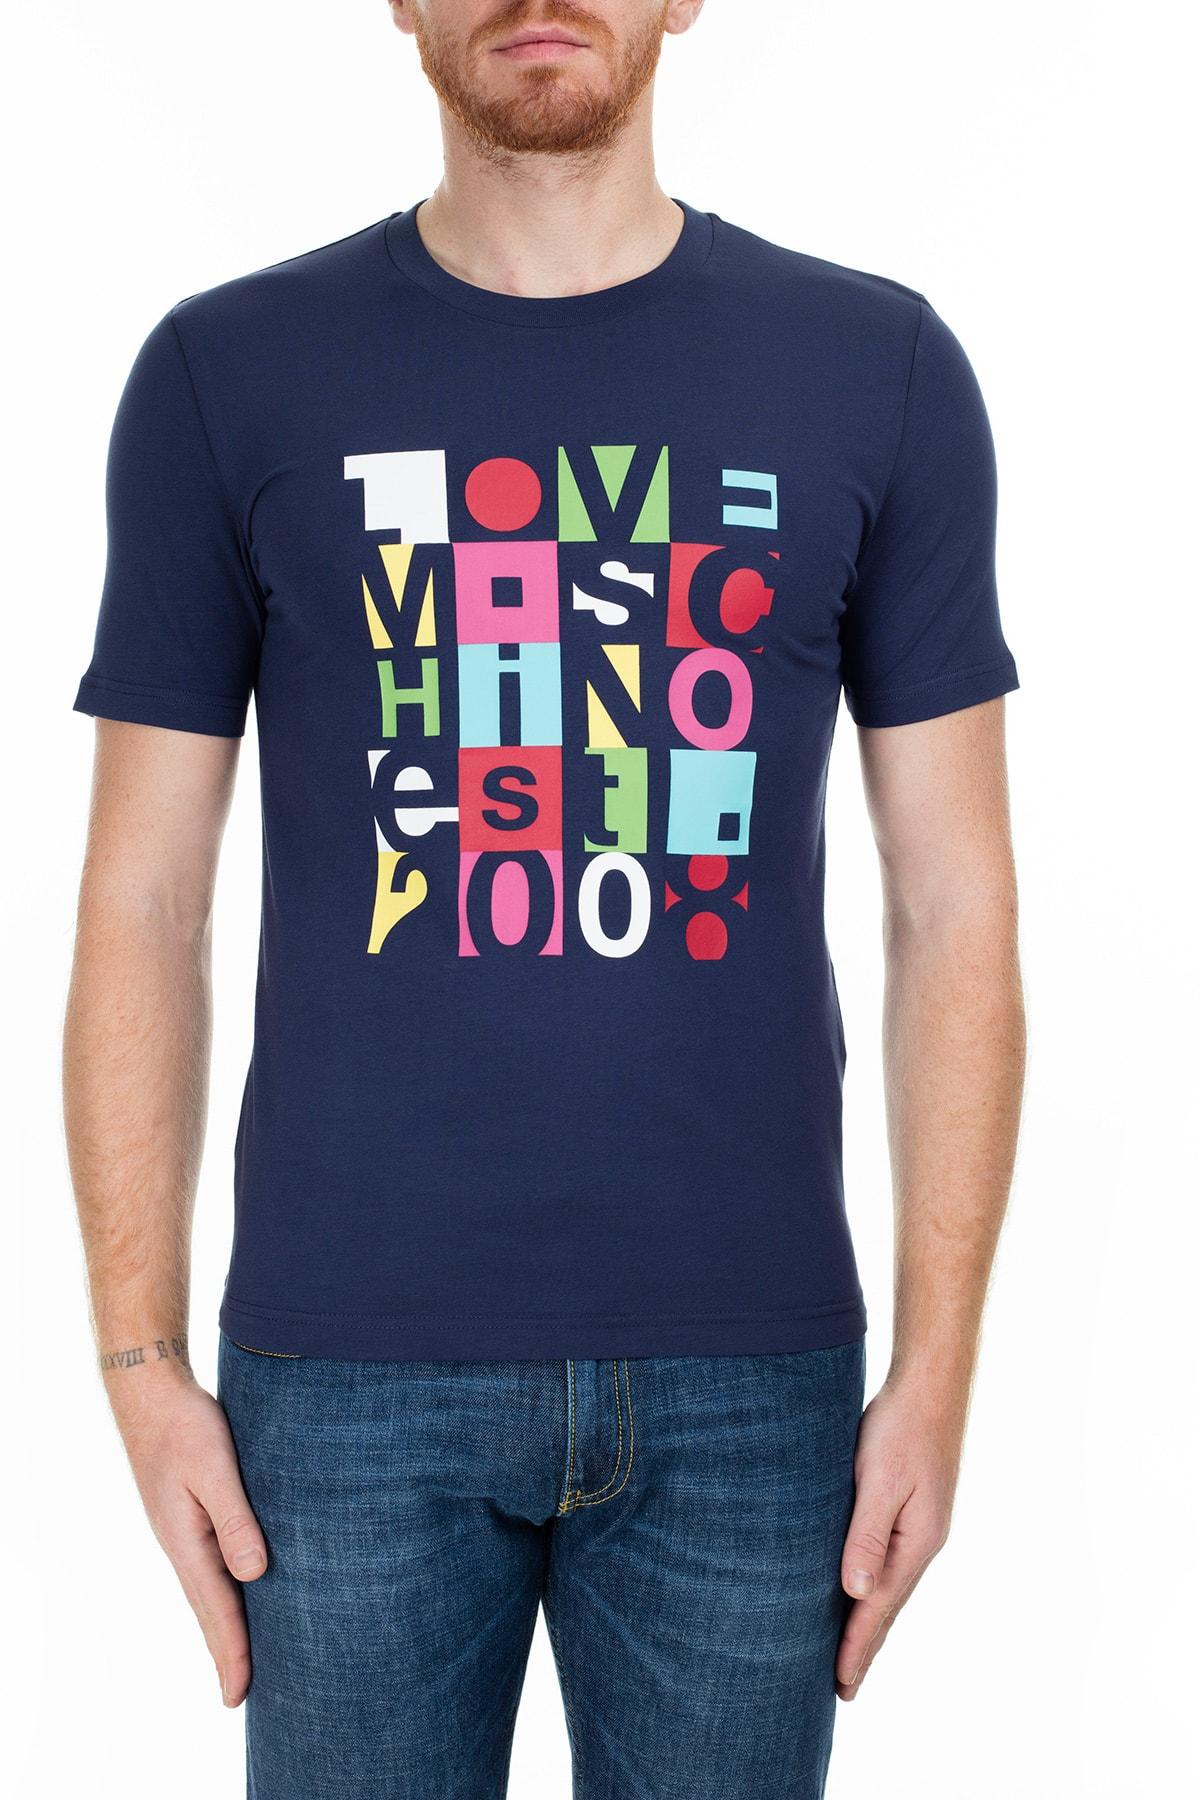 Love Moschino Erkek Lacivert T-Shirt S M47312Le1811 Y61 1